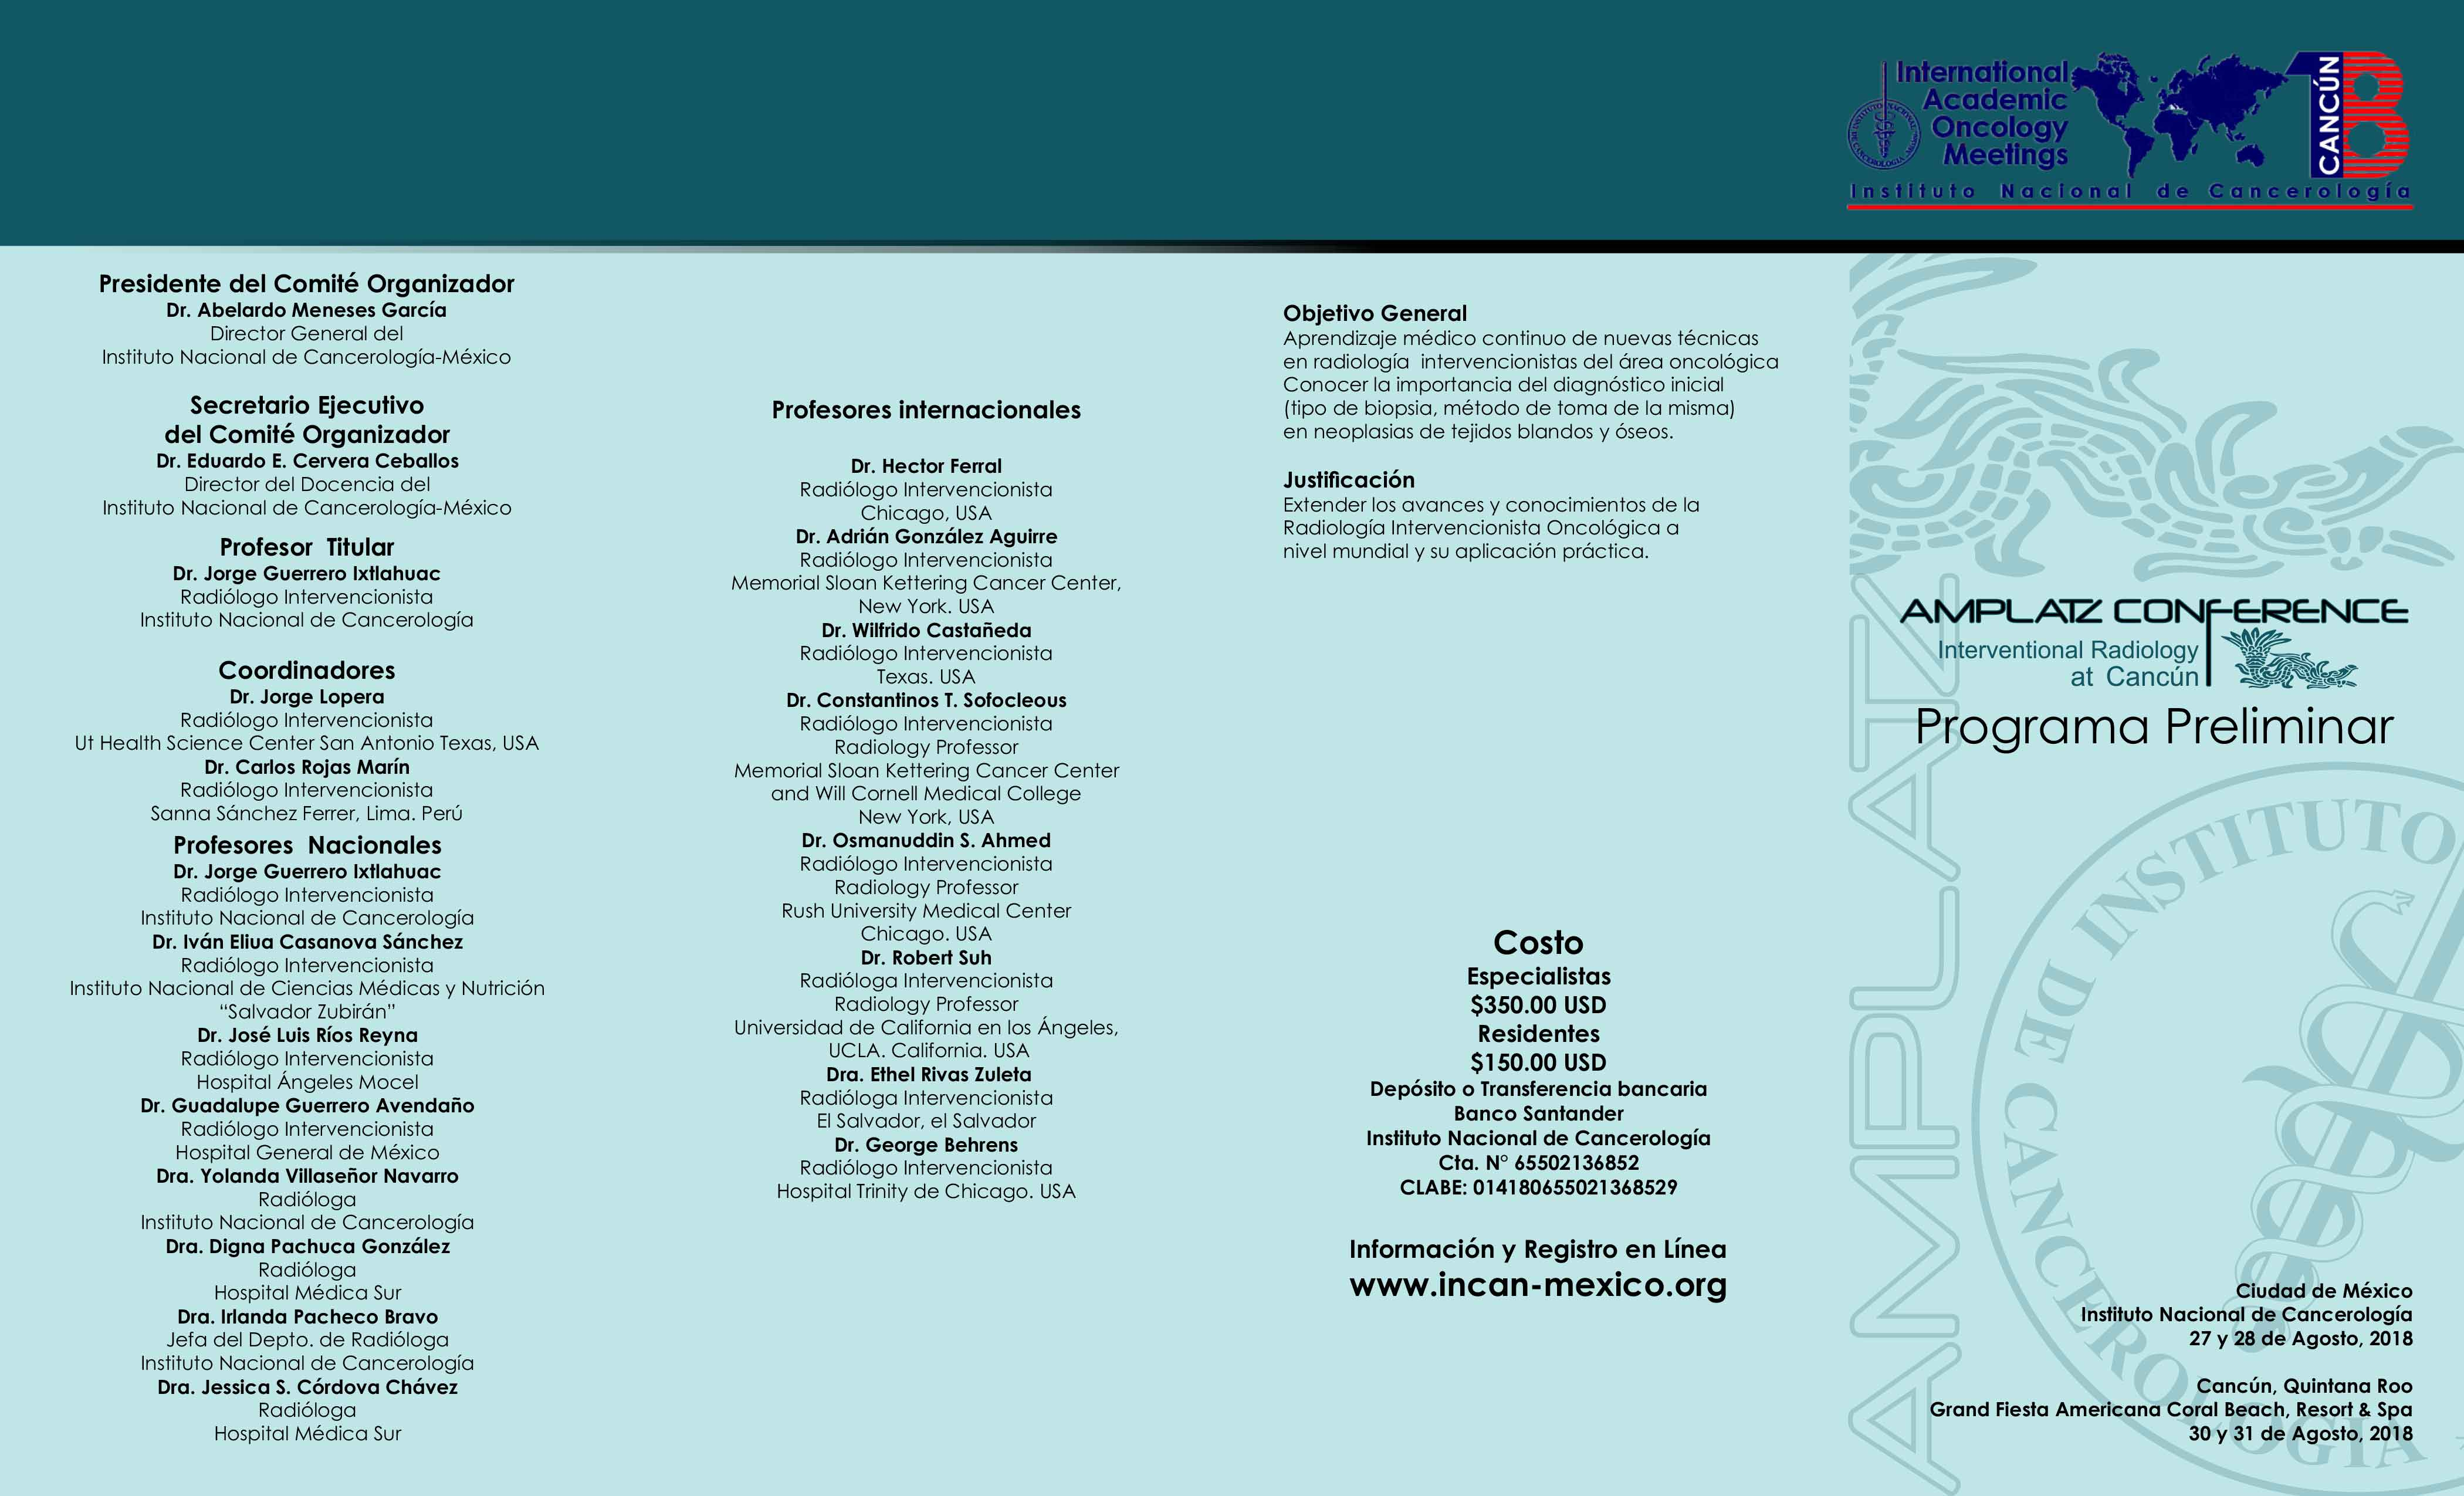 Amplatz Conference